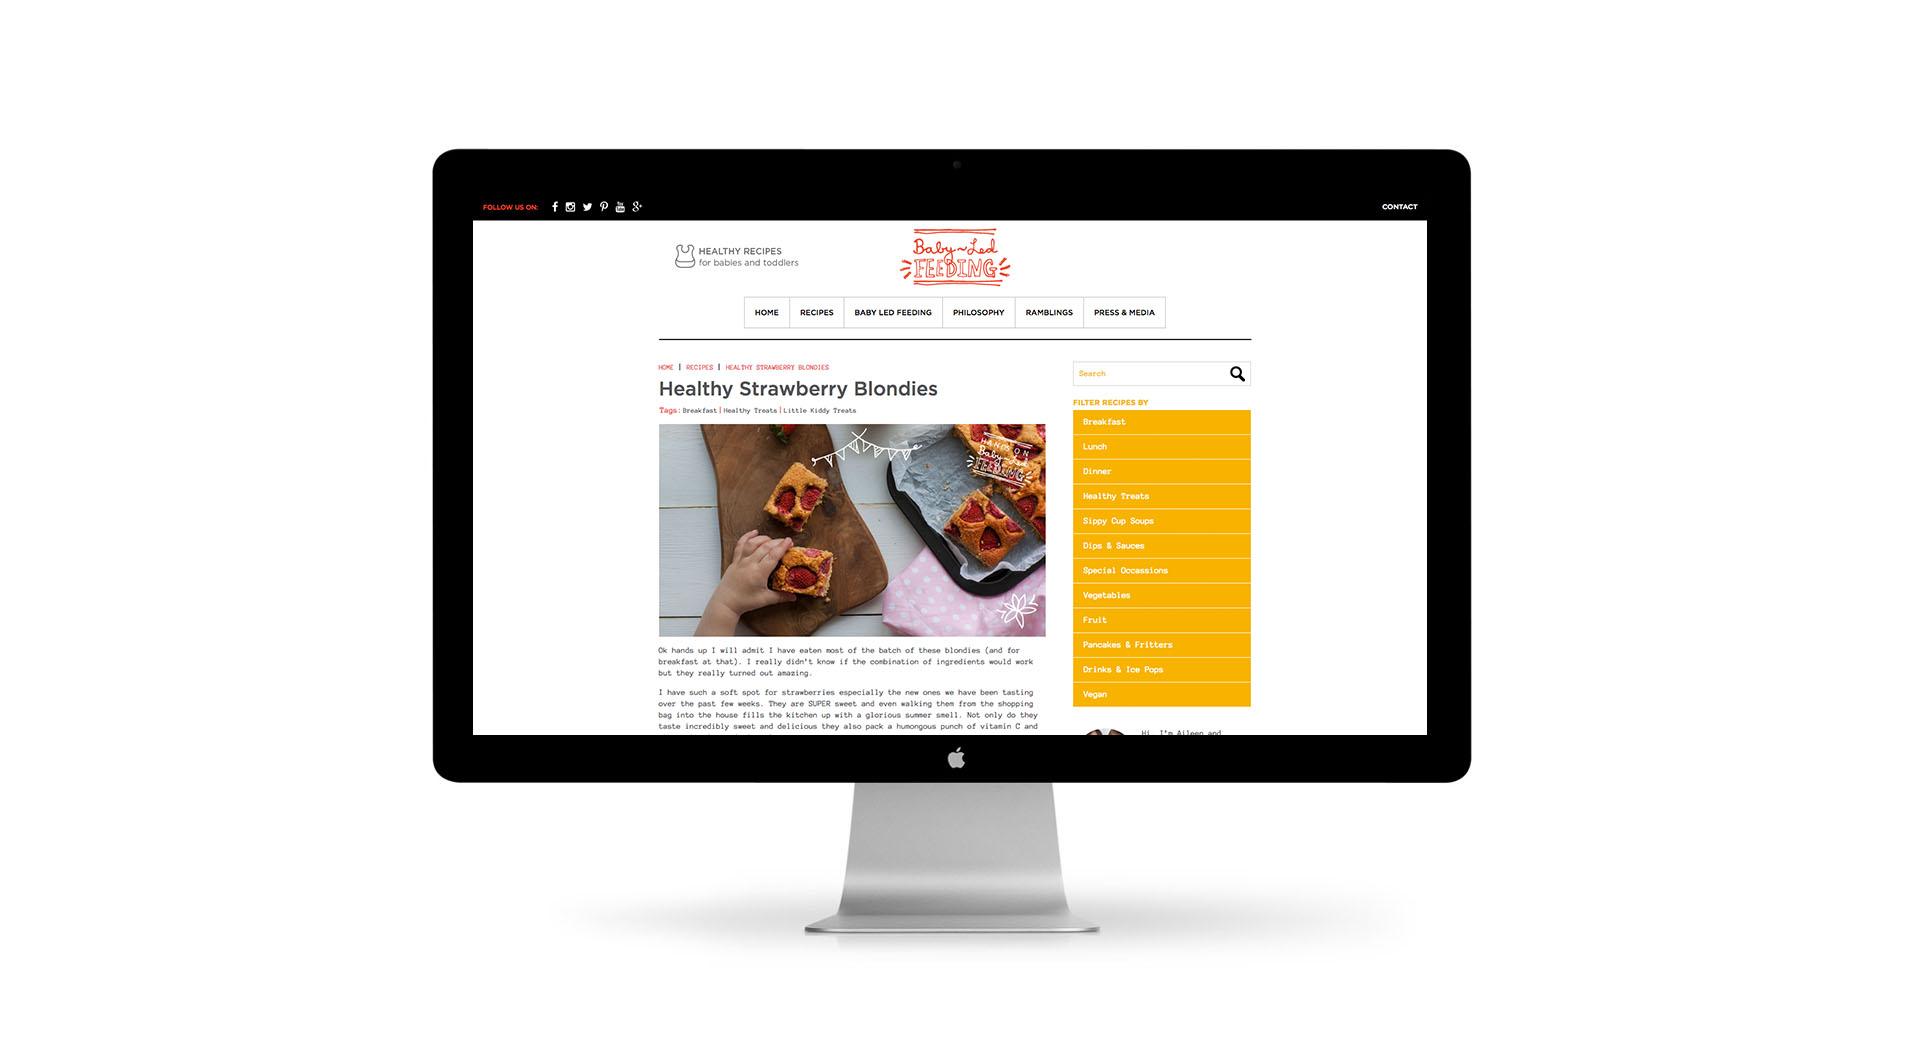 Baby Led Feeding Branding and website for new food startup Irish company Recipe Layout.